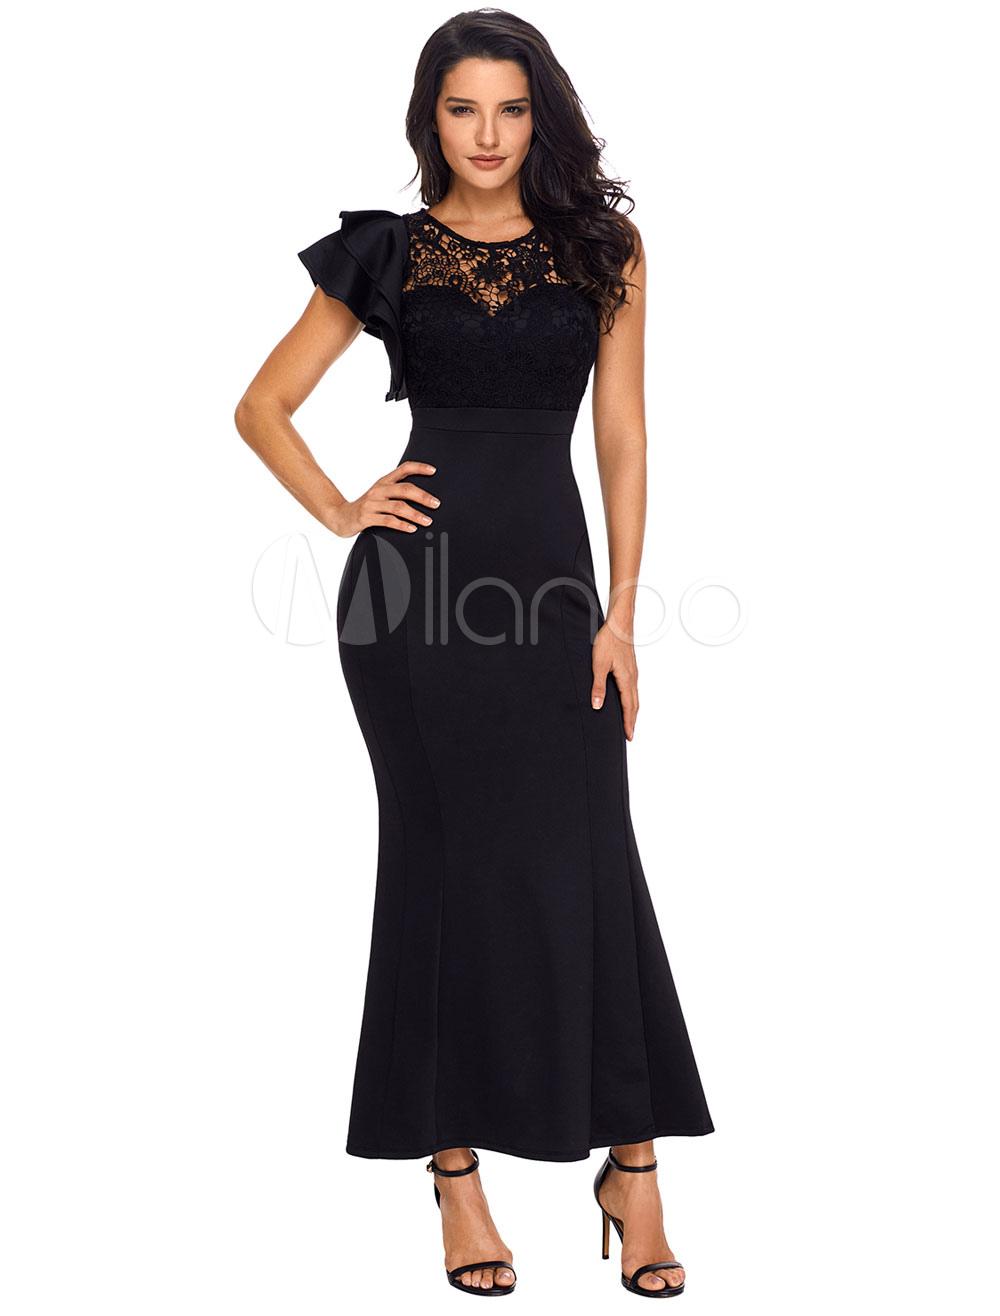 Buy Long Bodycon Dress Black Party Dress Lace Asymmetrical Ruffles Maxi Dress For Women for $28.04 in Milanoo store